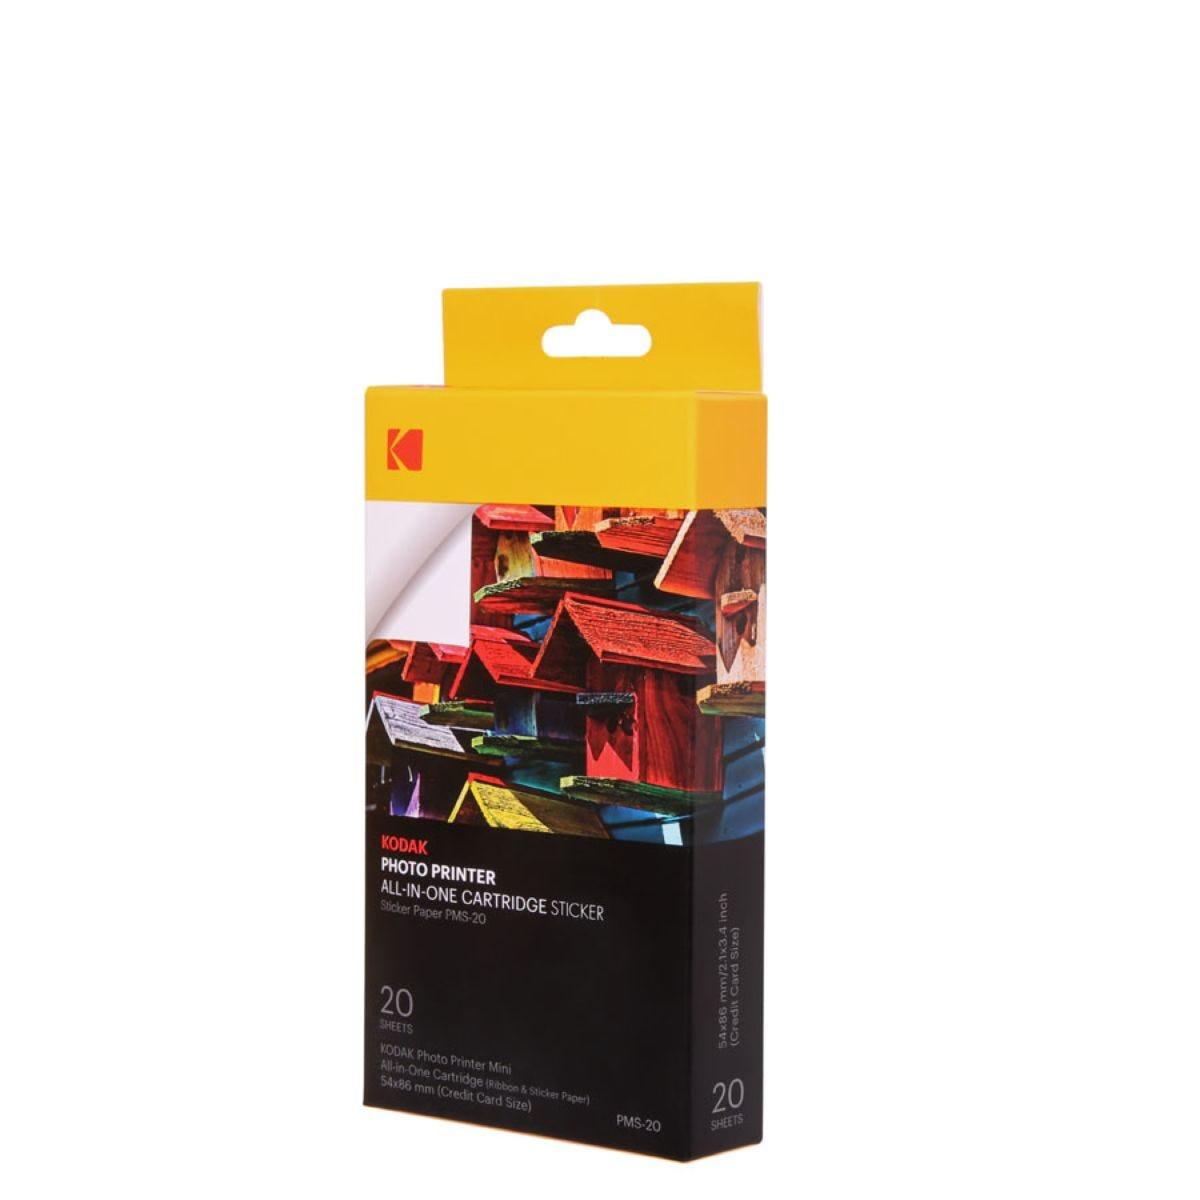 Kodak Mini Photo Printer Cartridge – 20 Pack / Sticky